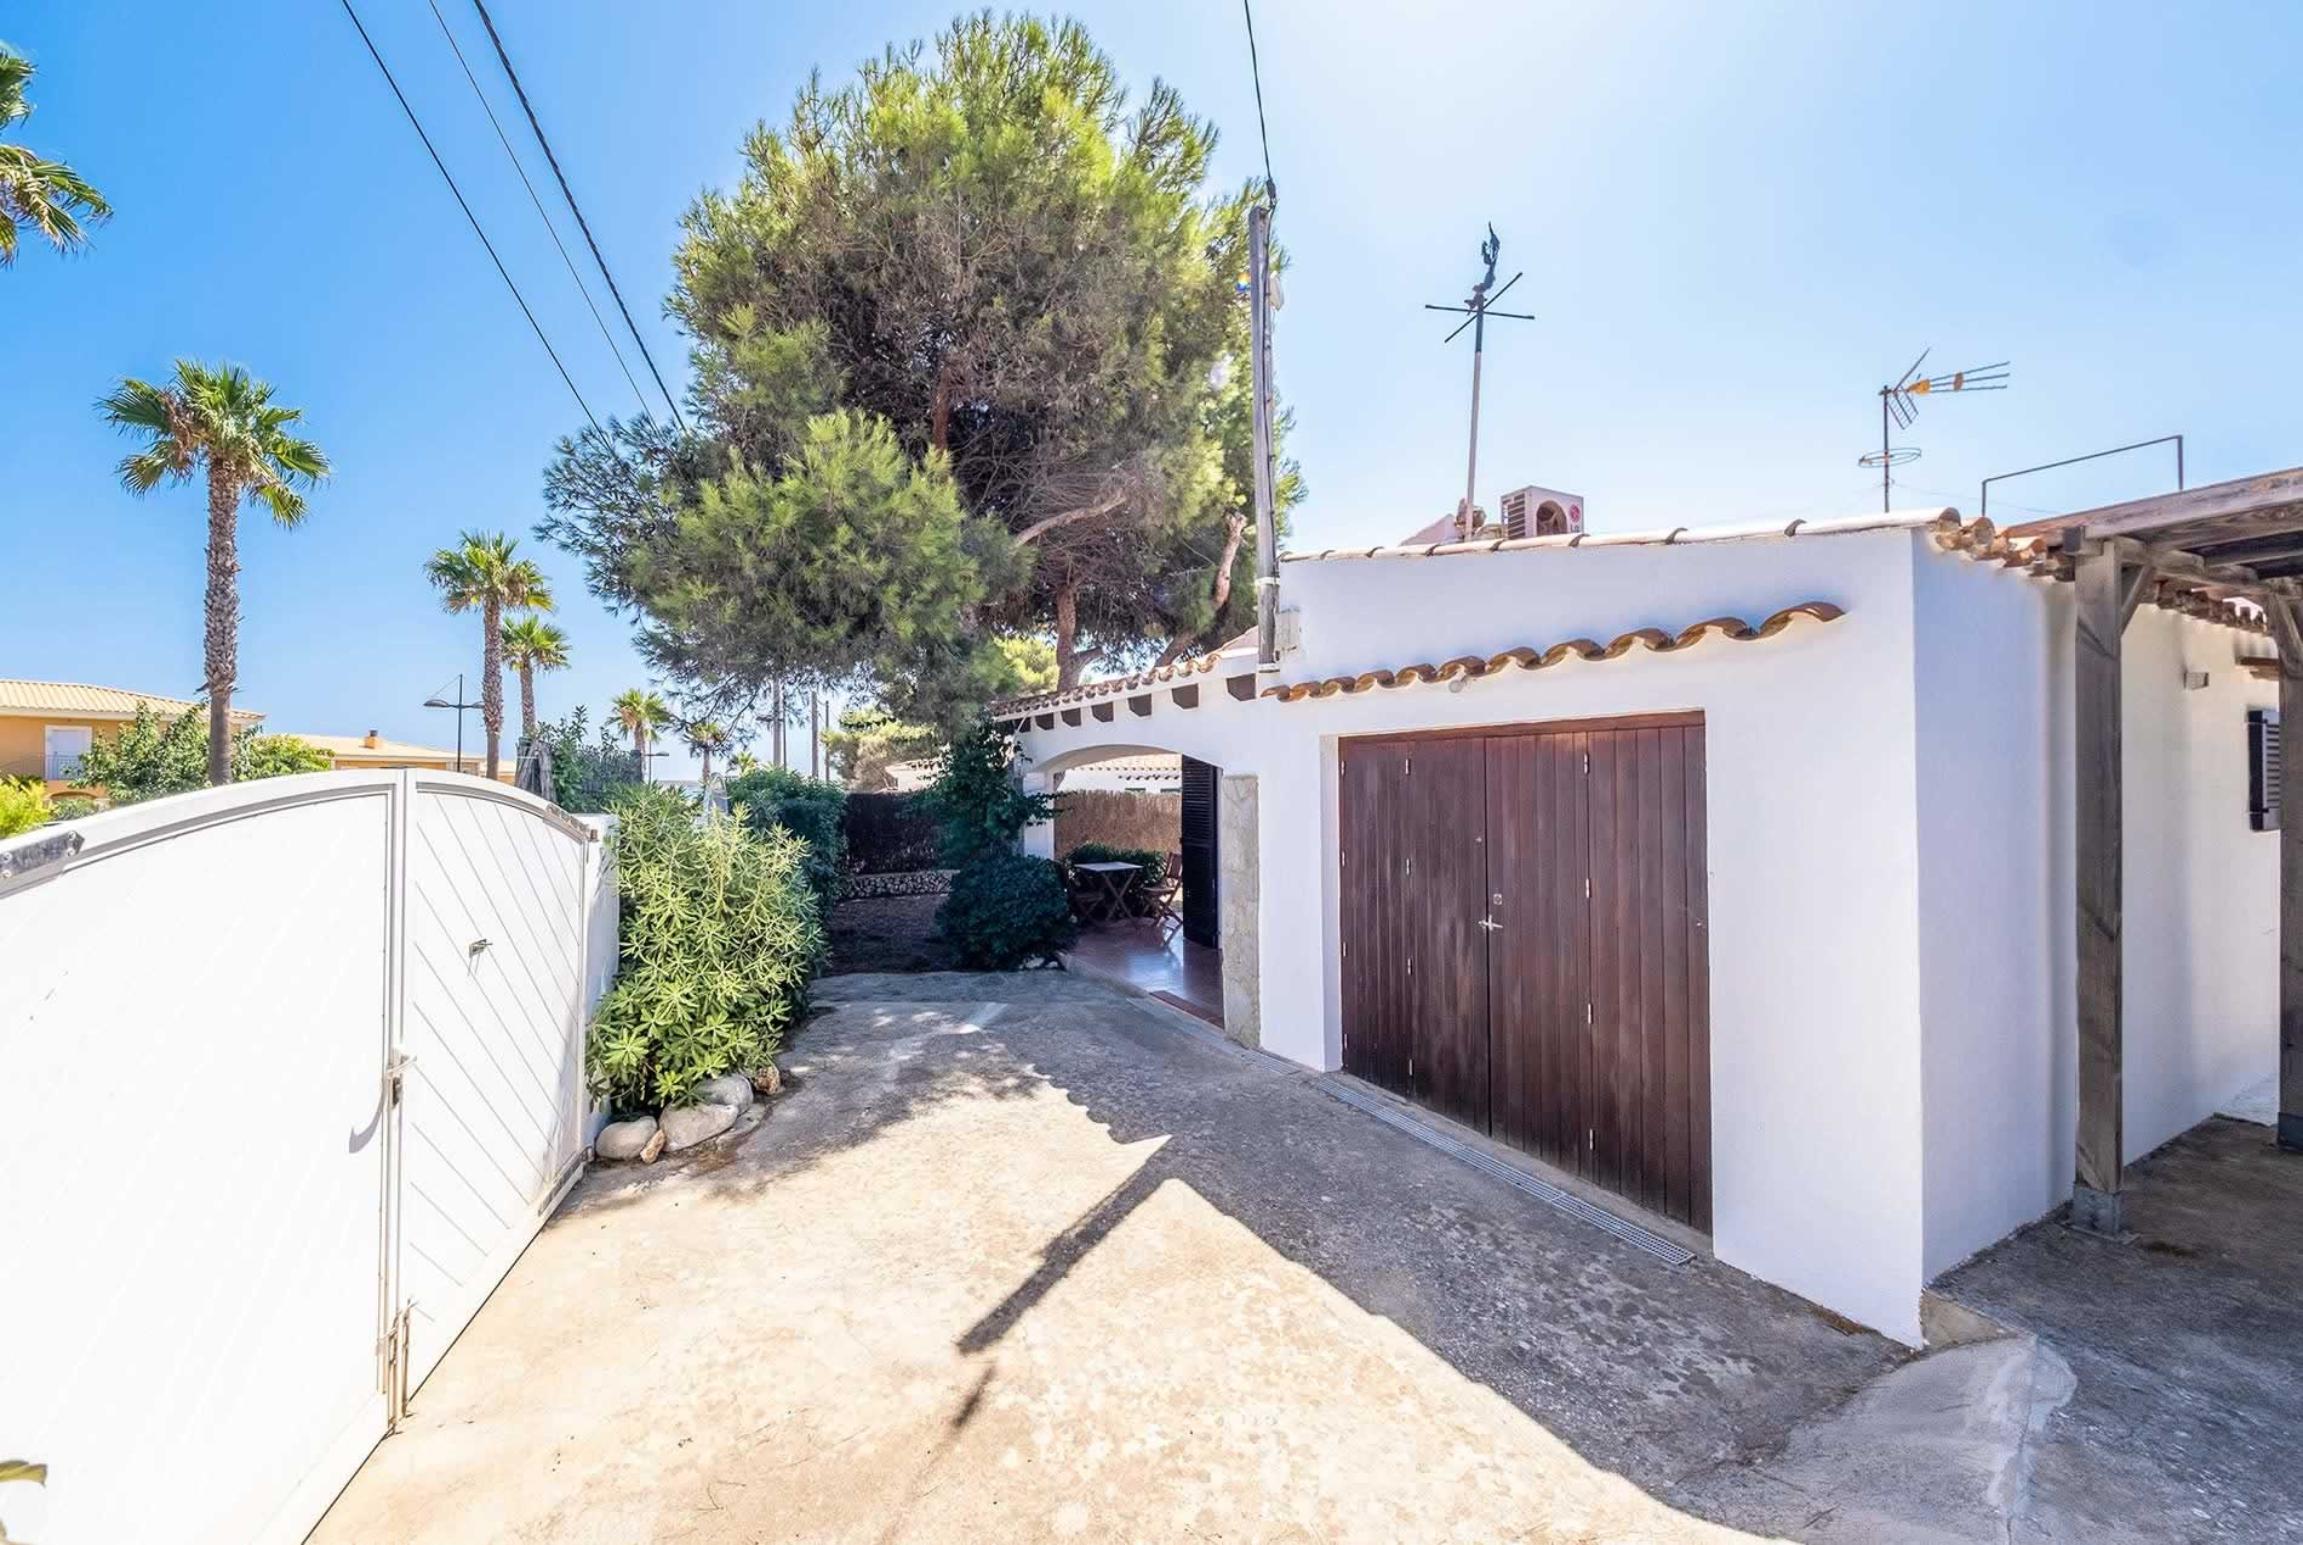 Ferienhaus Iris Prima (2653680), Punta Prima, Menorca, Balearische Inseln, Spanien, Bild 21